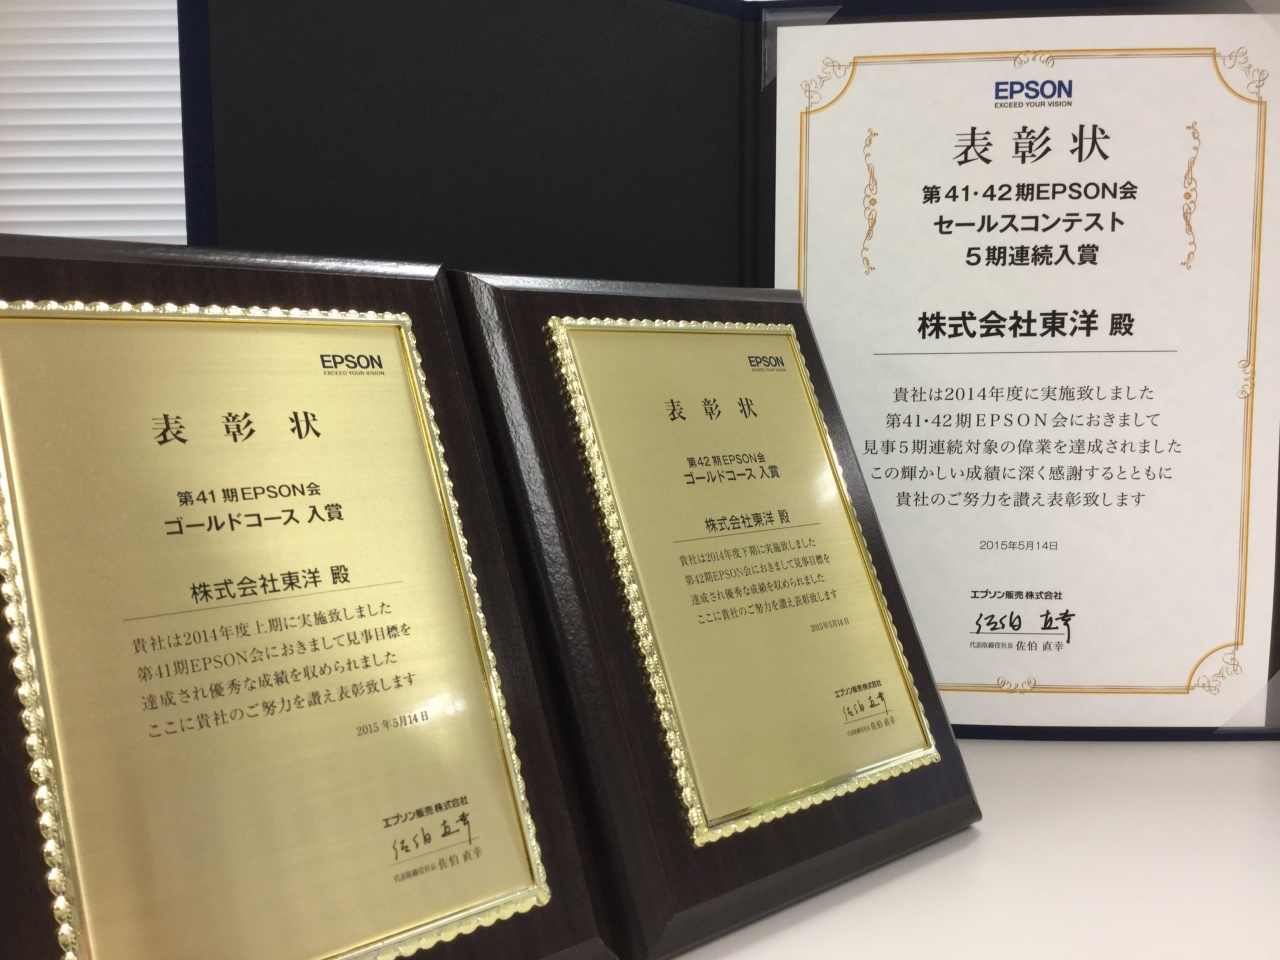 EPSON会 セールスコンテスト5期連続入賞